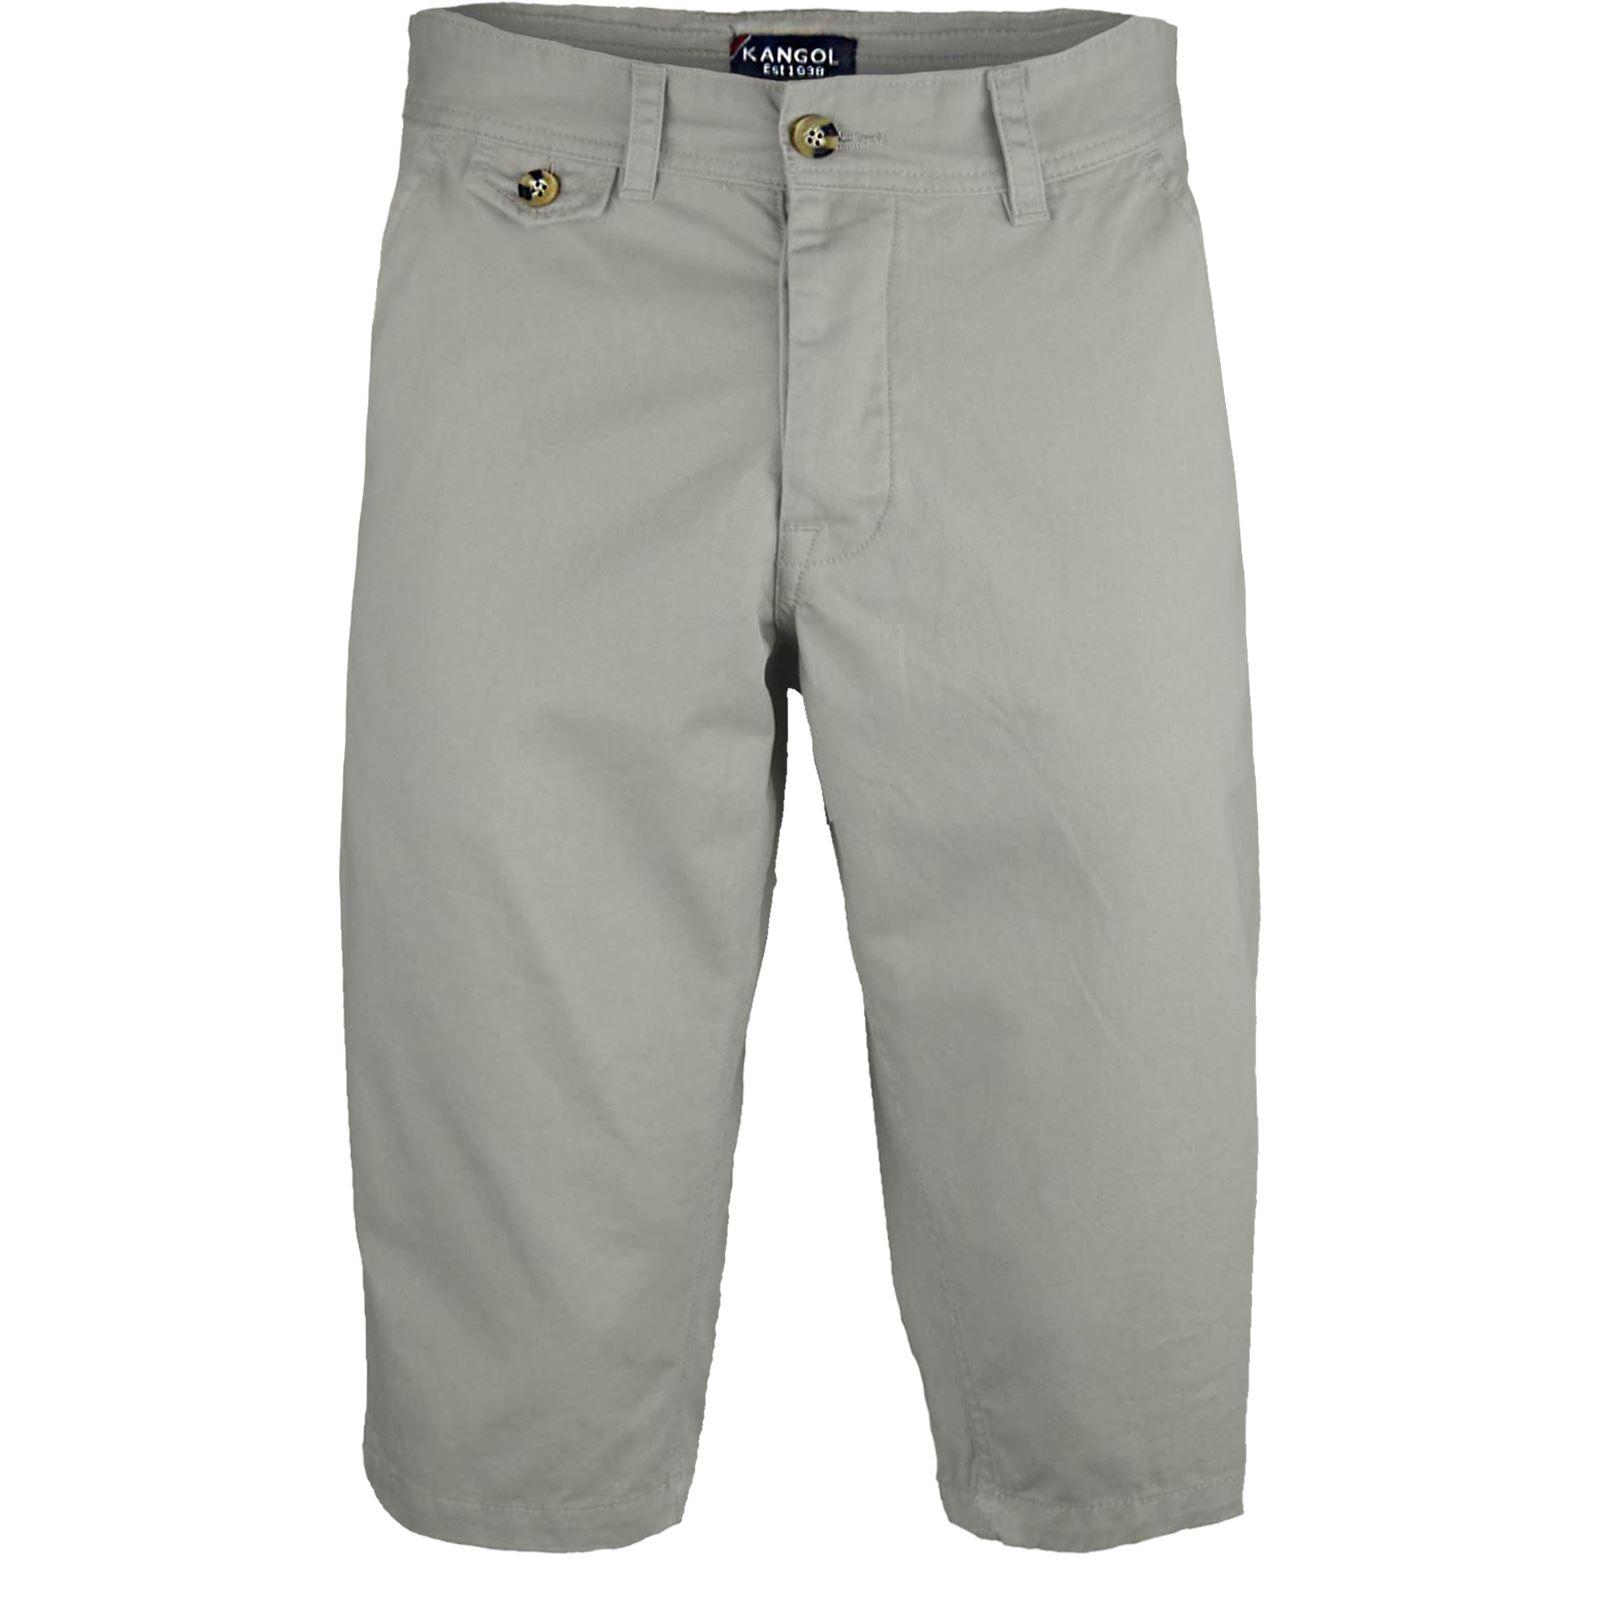 Les Pantalons - 3/4 Pantalons Longs Till.da zrUJa7